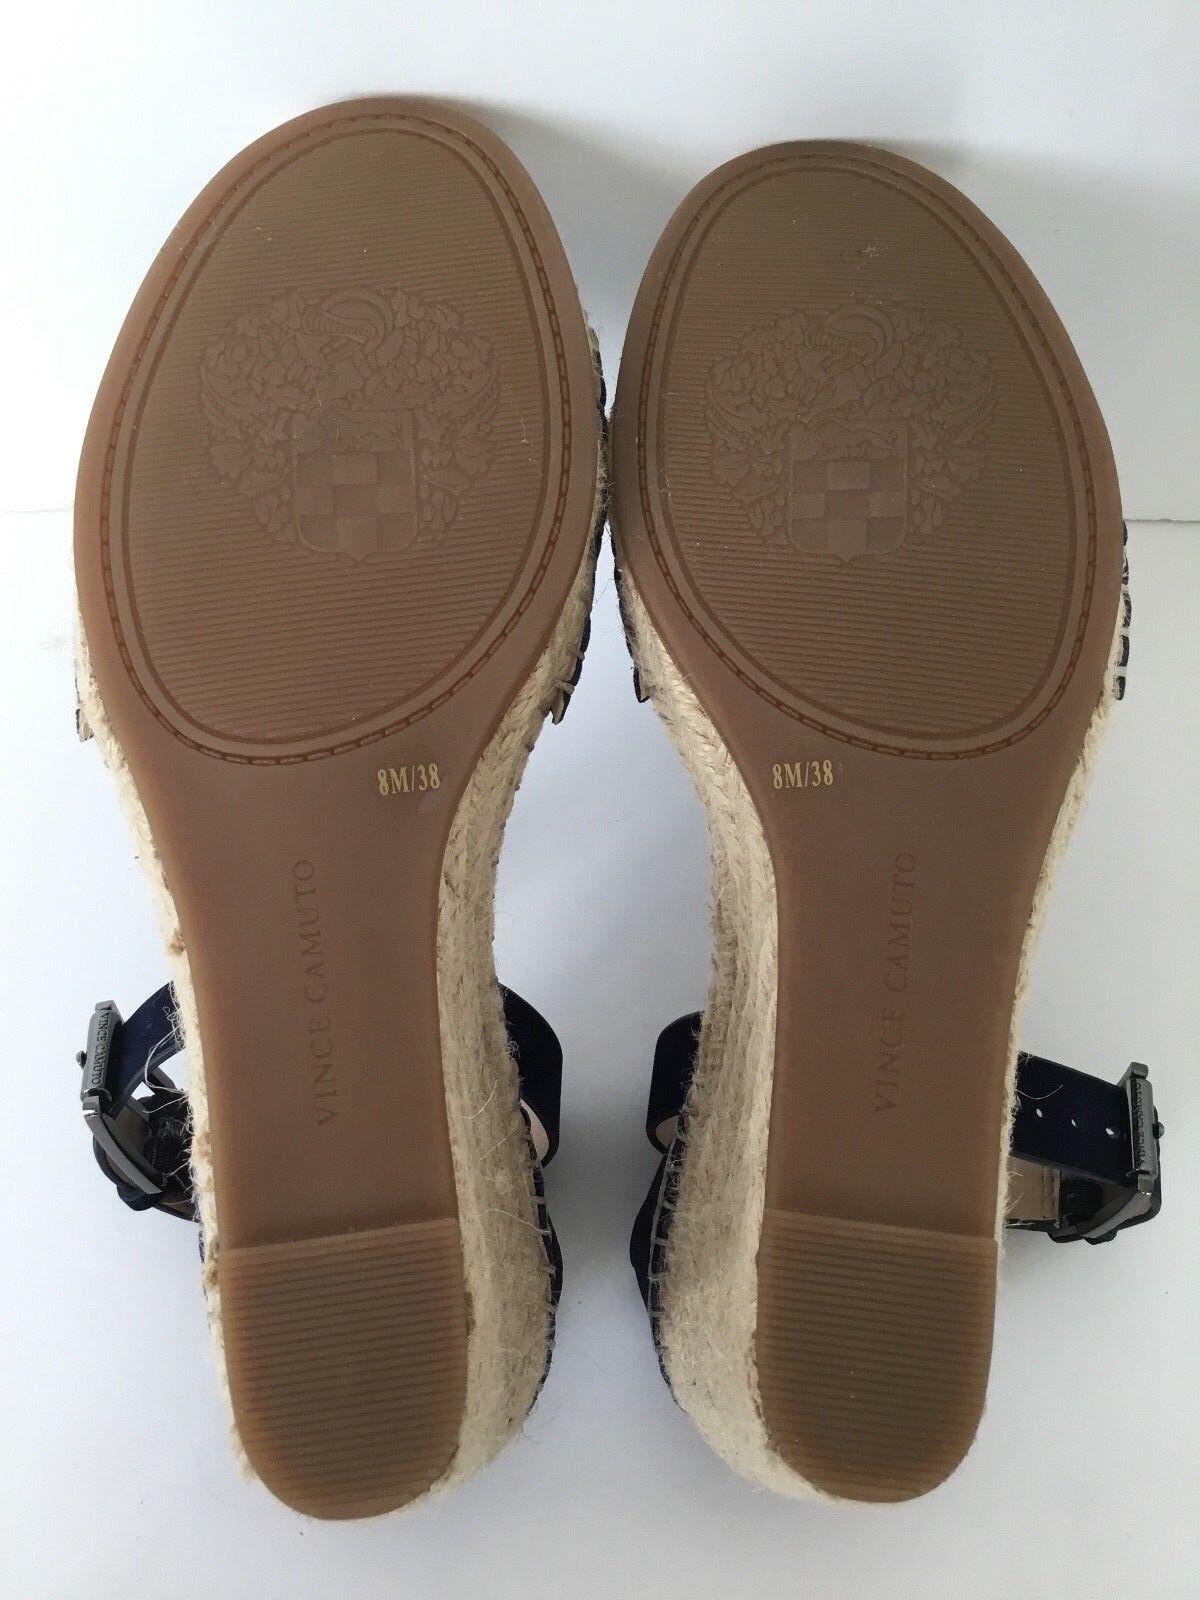 Vince Camuto Espadrille Wedge Sandales 8 Größe 8 Sandales 4b16b9